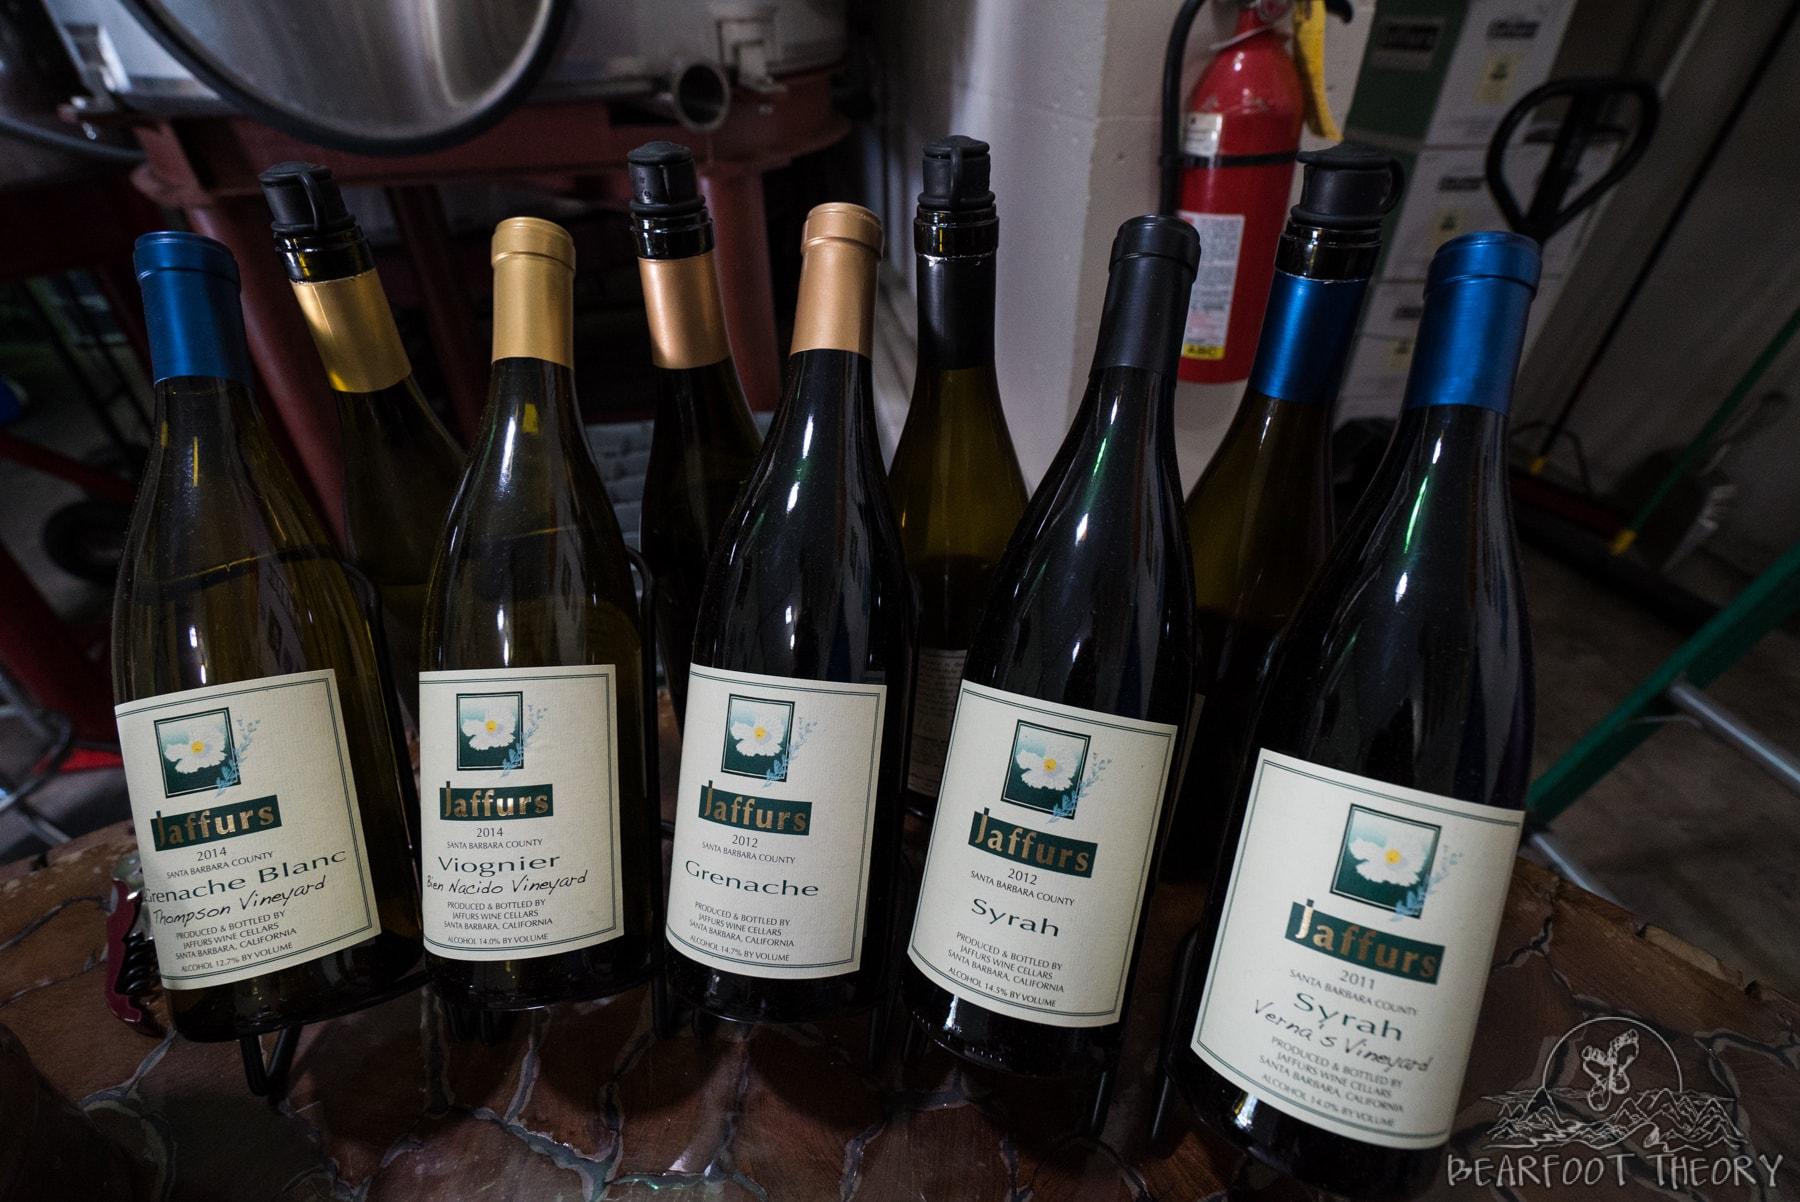 Jaffurs Winery - One of my favorite stops on Santa Barbara's wine trail